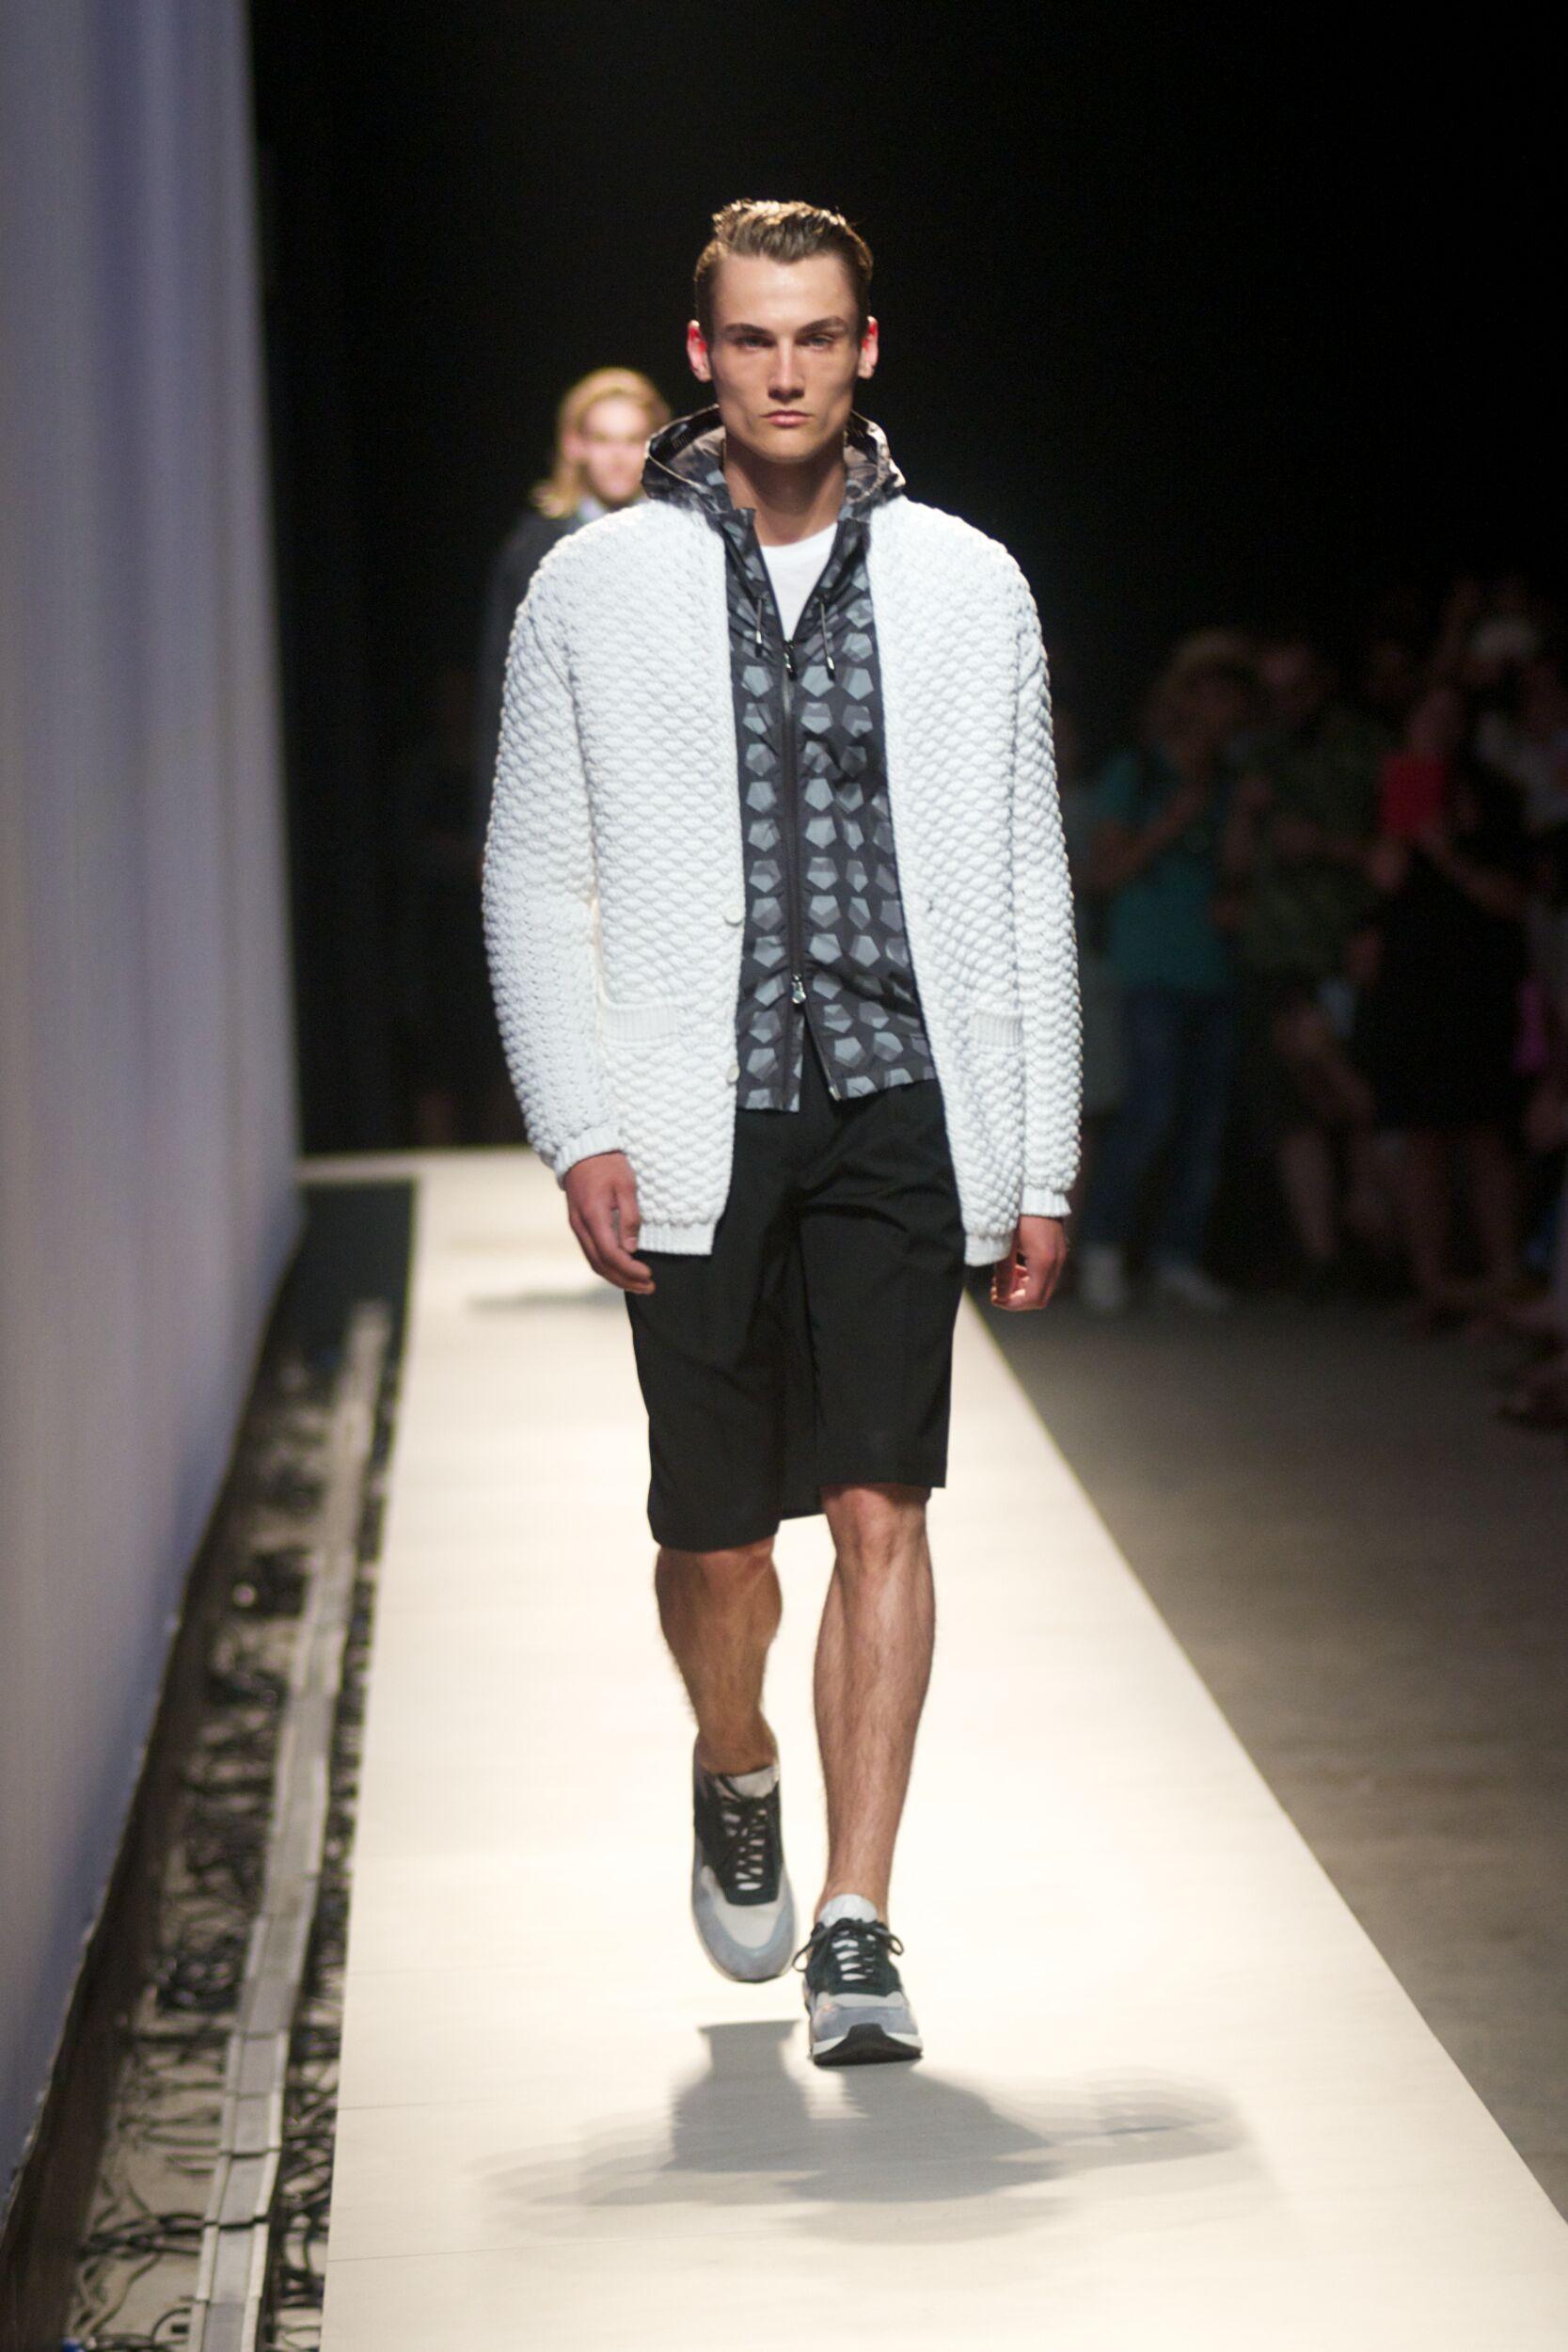 Fashion Man Model Z Zegna Catwalk